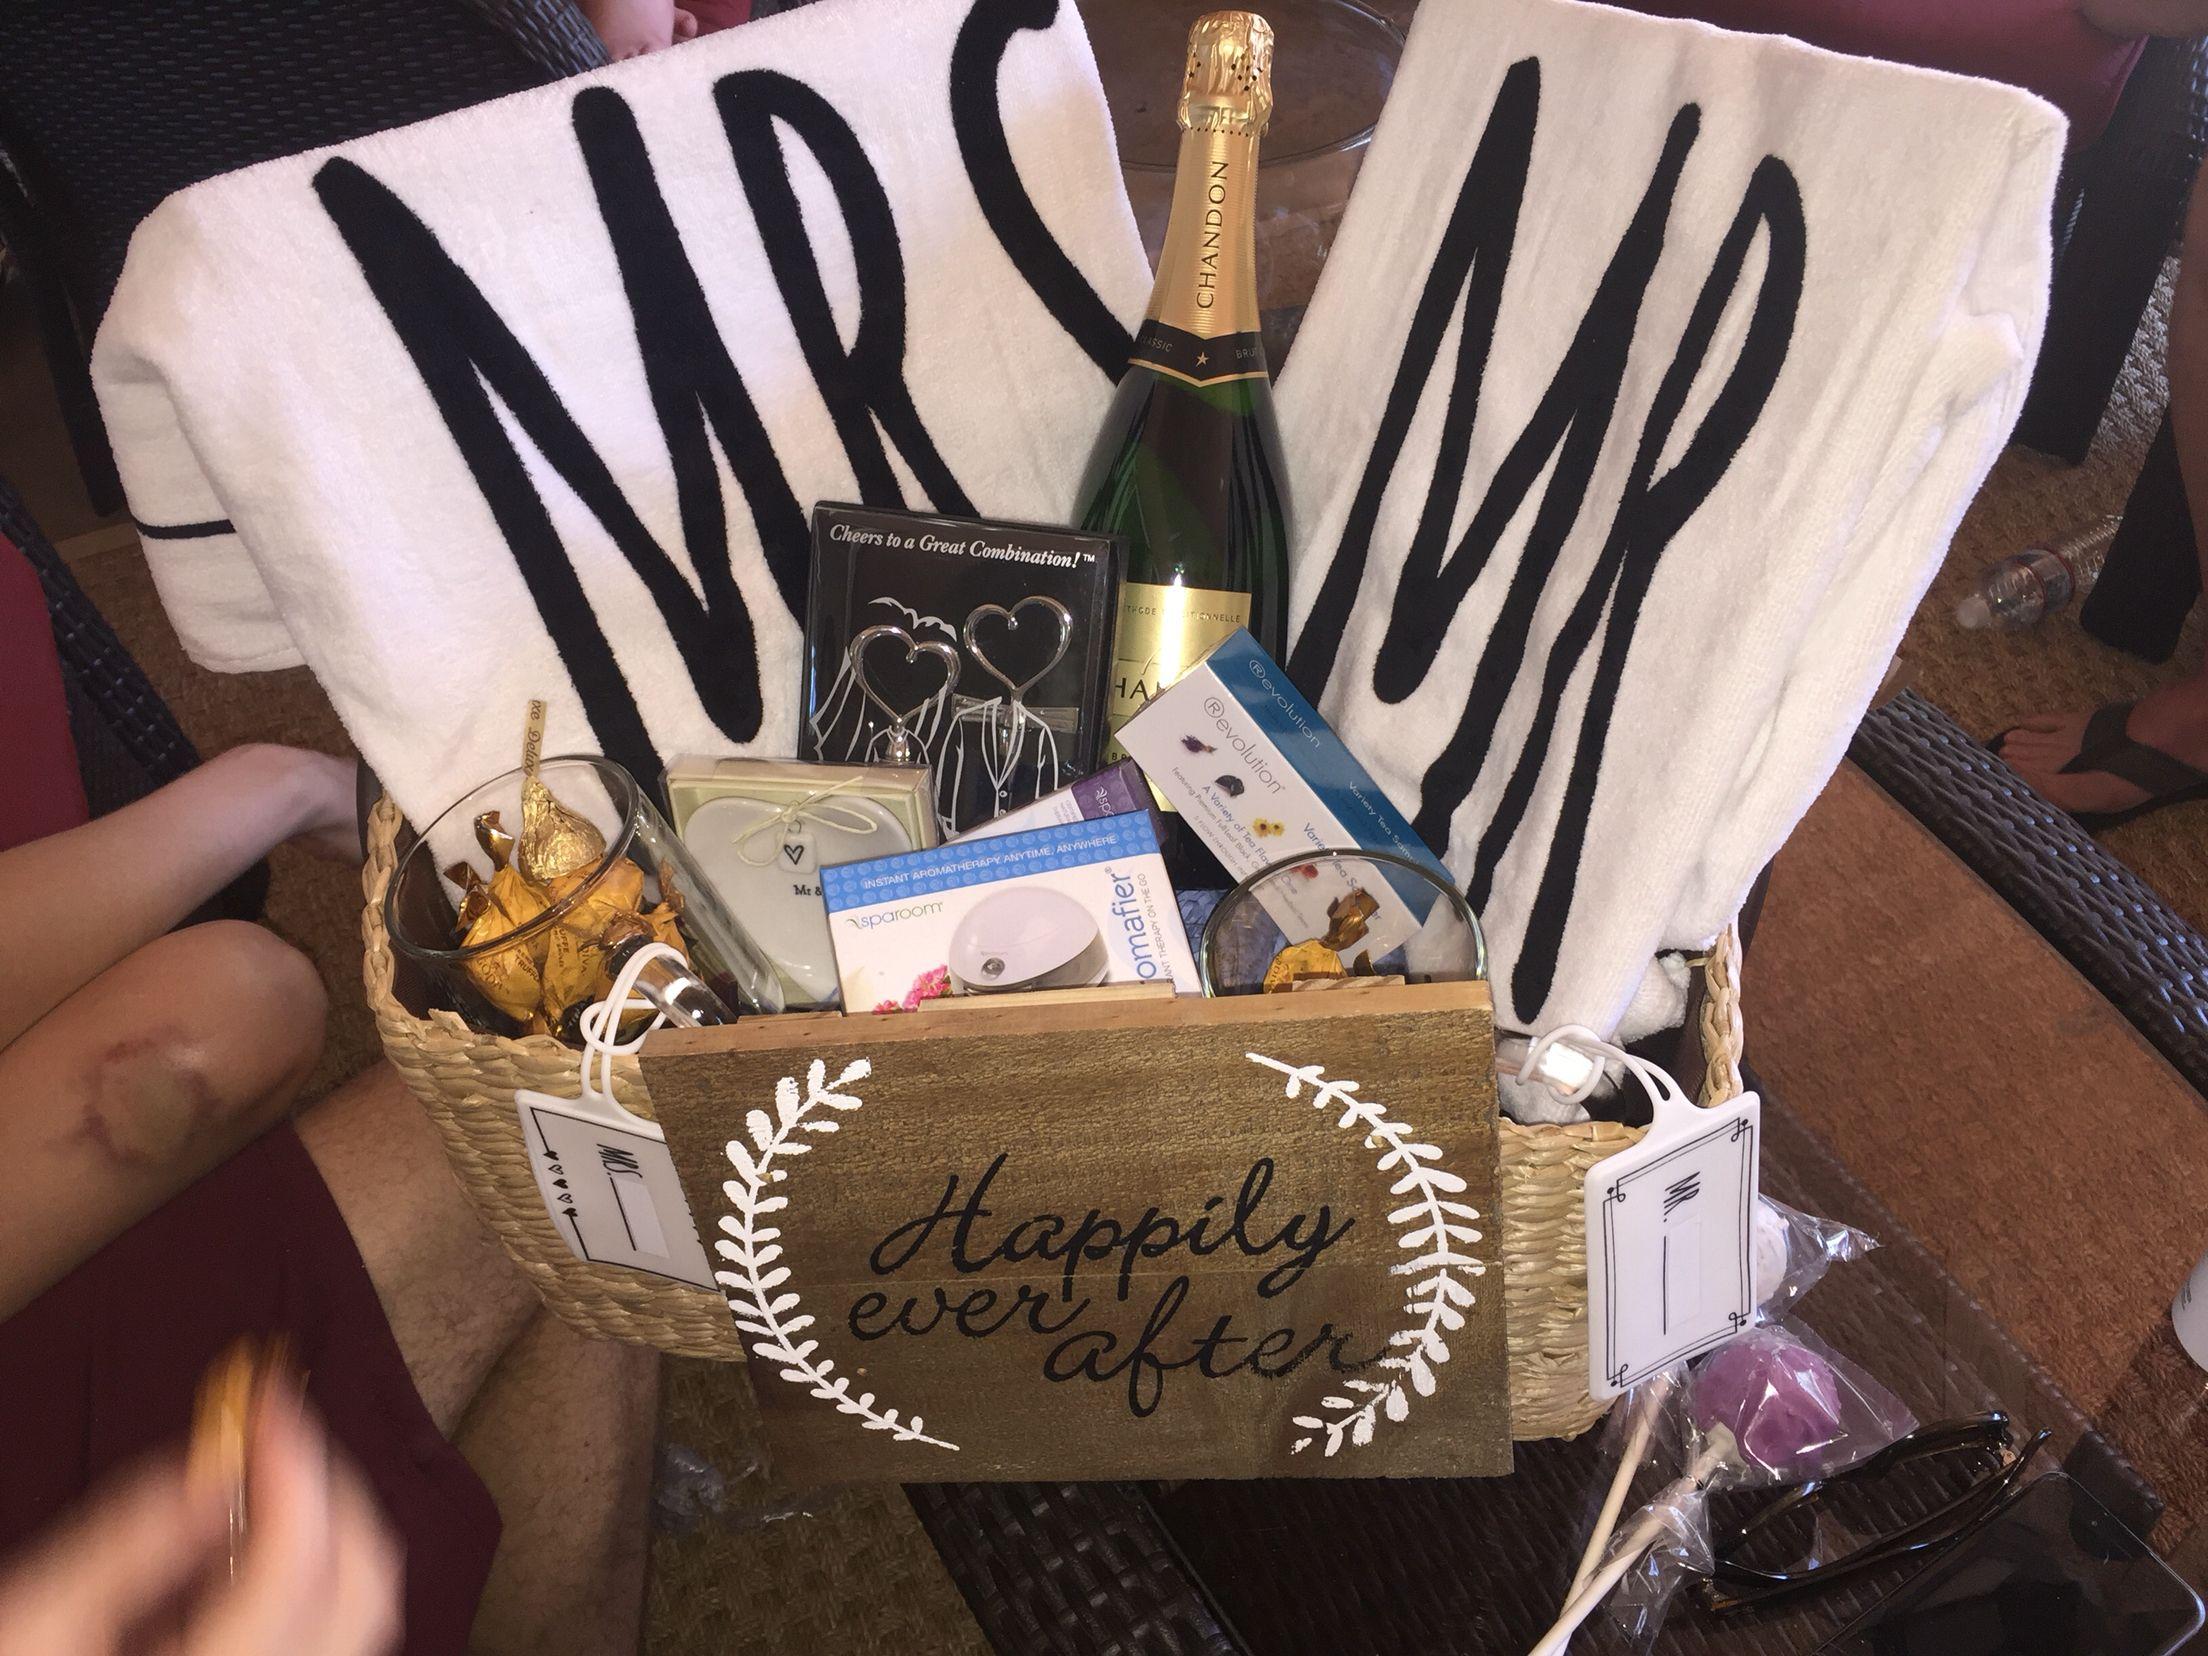 Wedding Gifts Honeymoon: Honeymoon Gift Basket For My Sister. Personalized It With